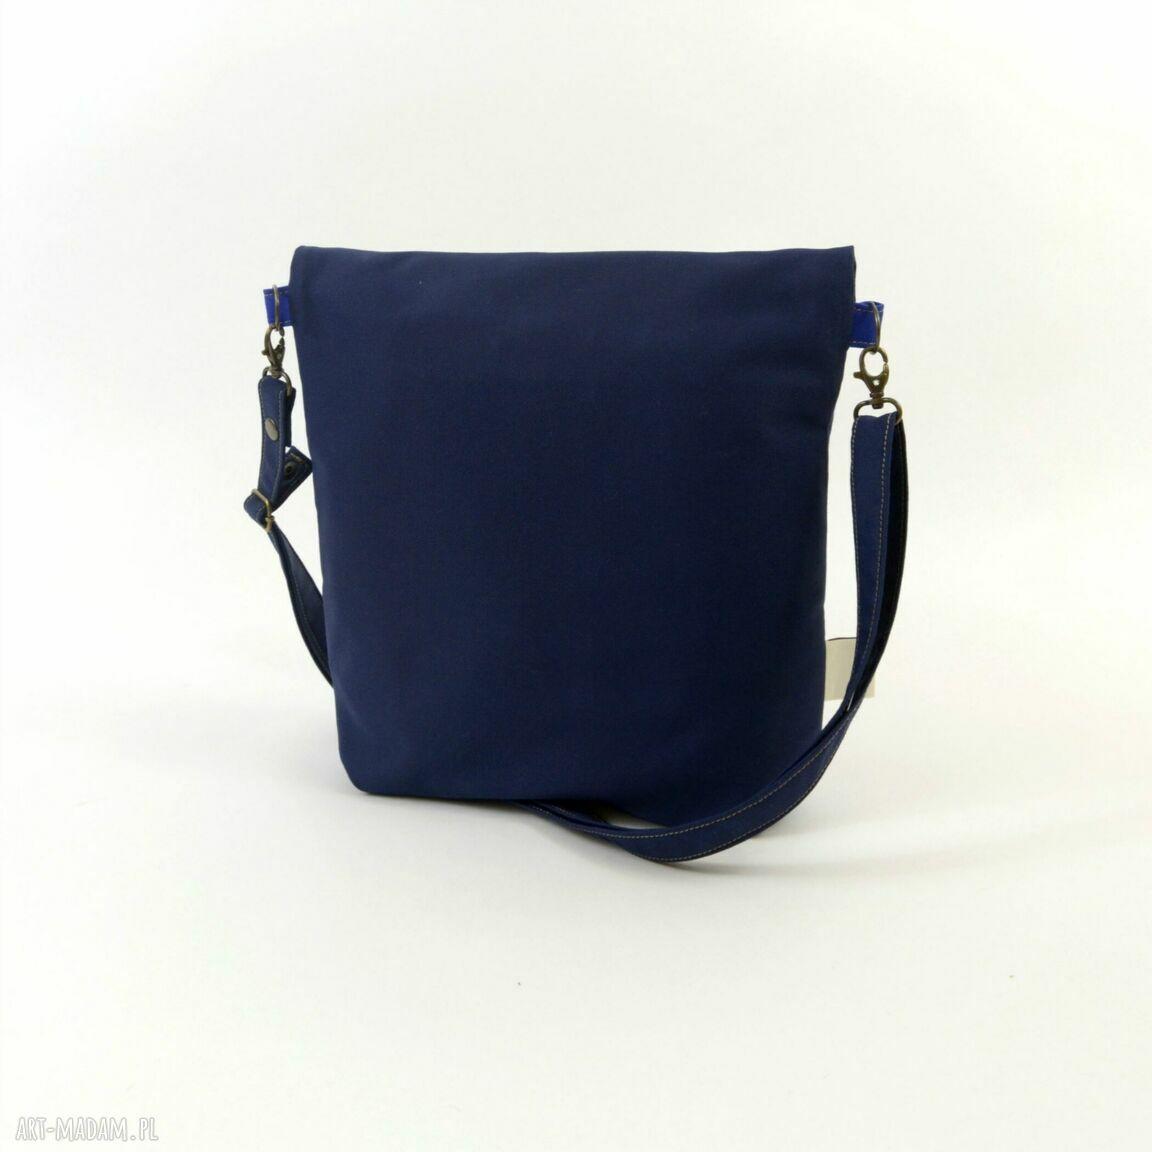 święta upominki damska torebka na ramię minibag no. 2